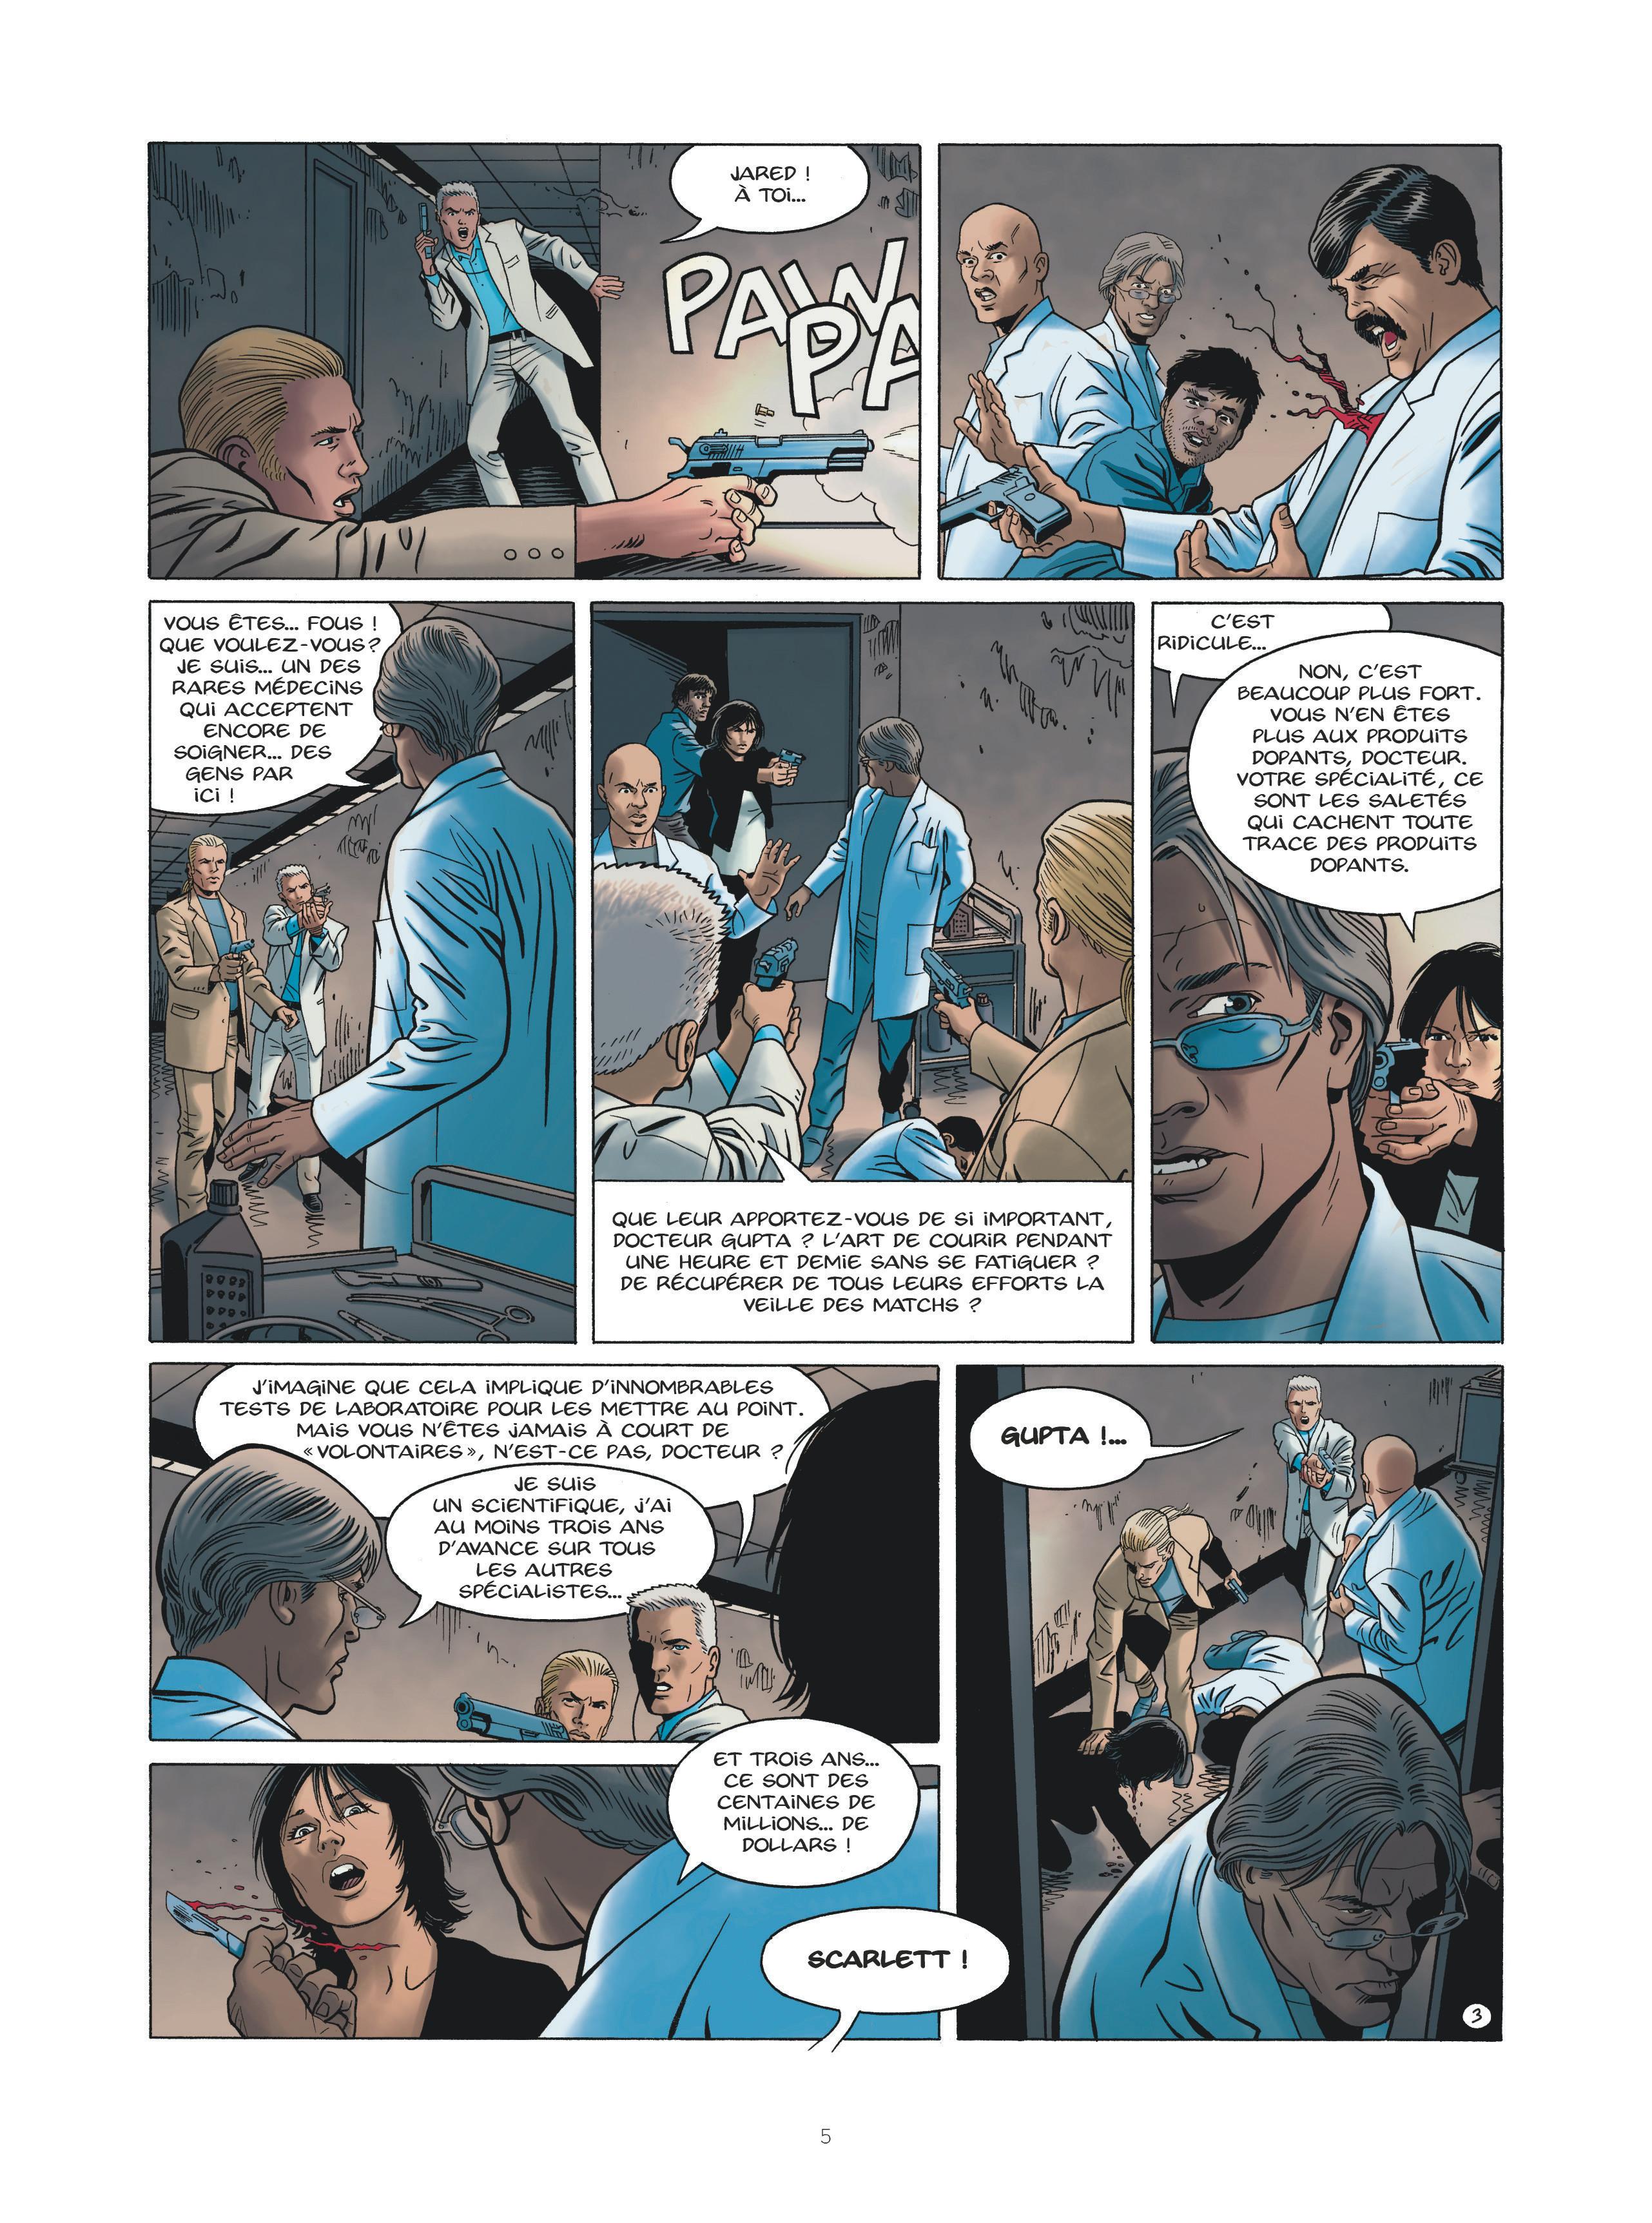 I.R.$._Team#4_Page 5